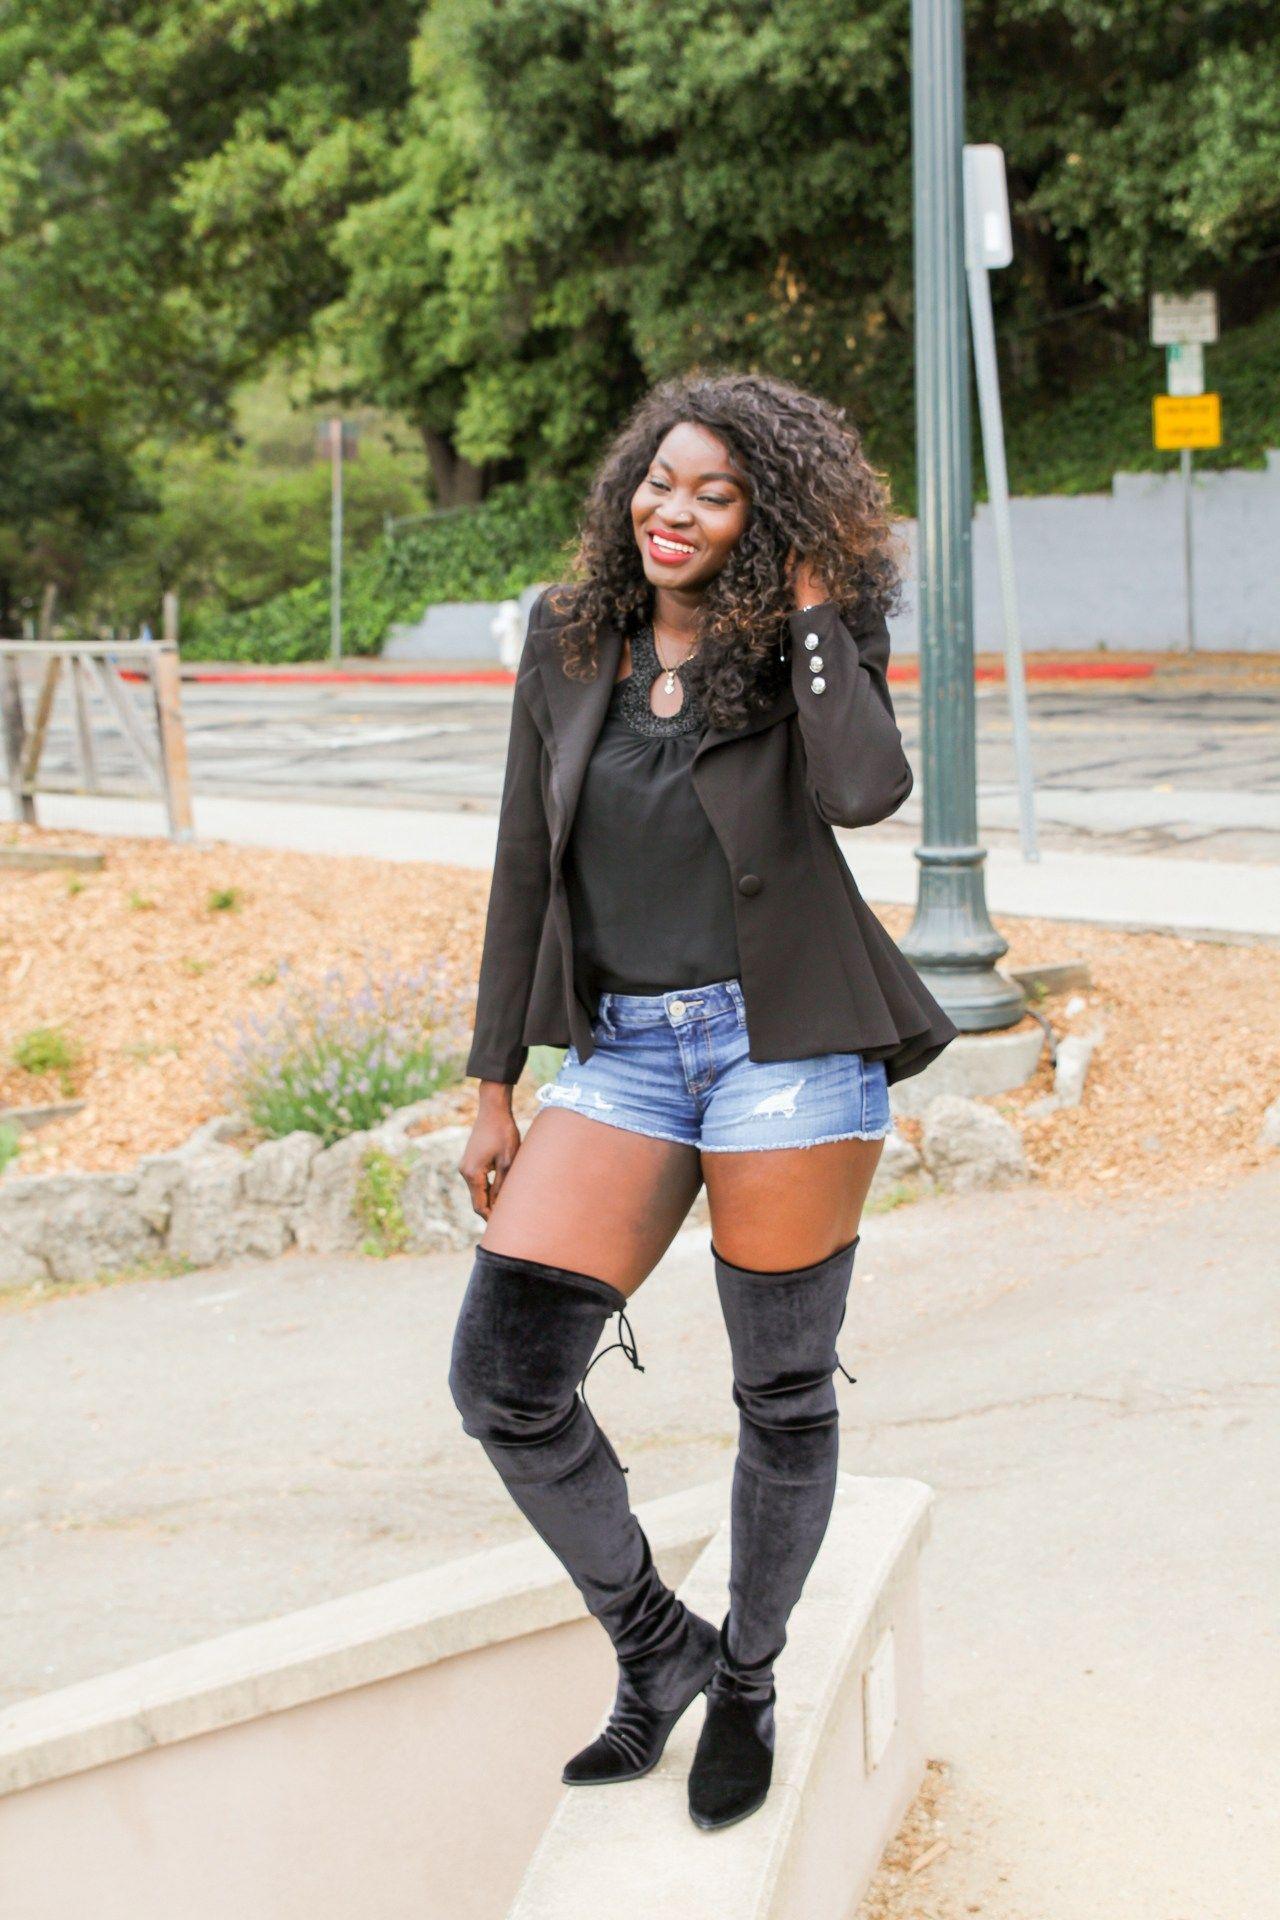 460f9a04ff3 Leggy Lady  Over the knee boots and denim shorts – Dafrastar